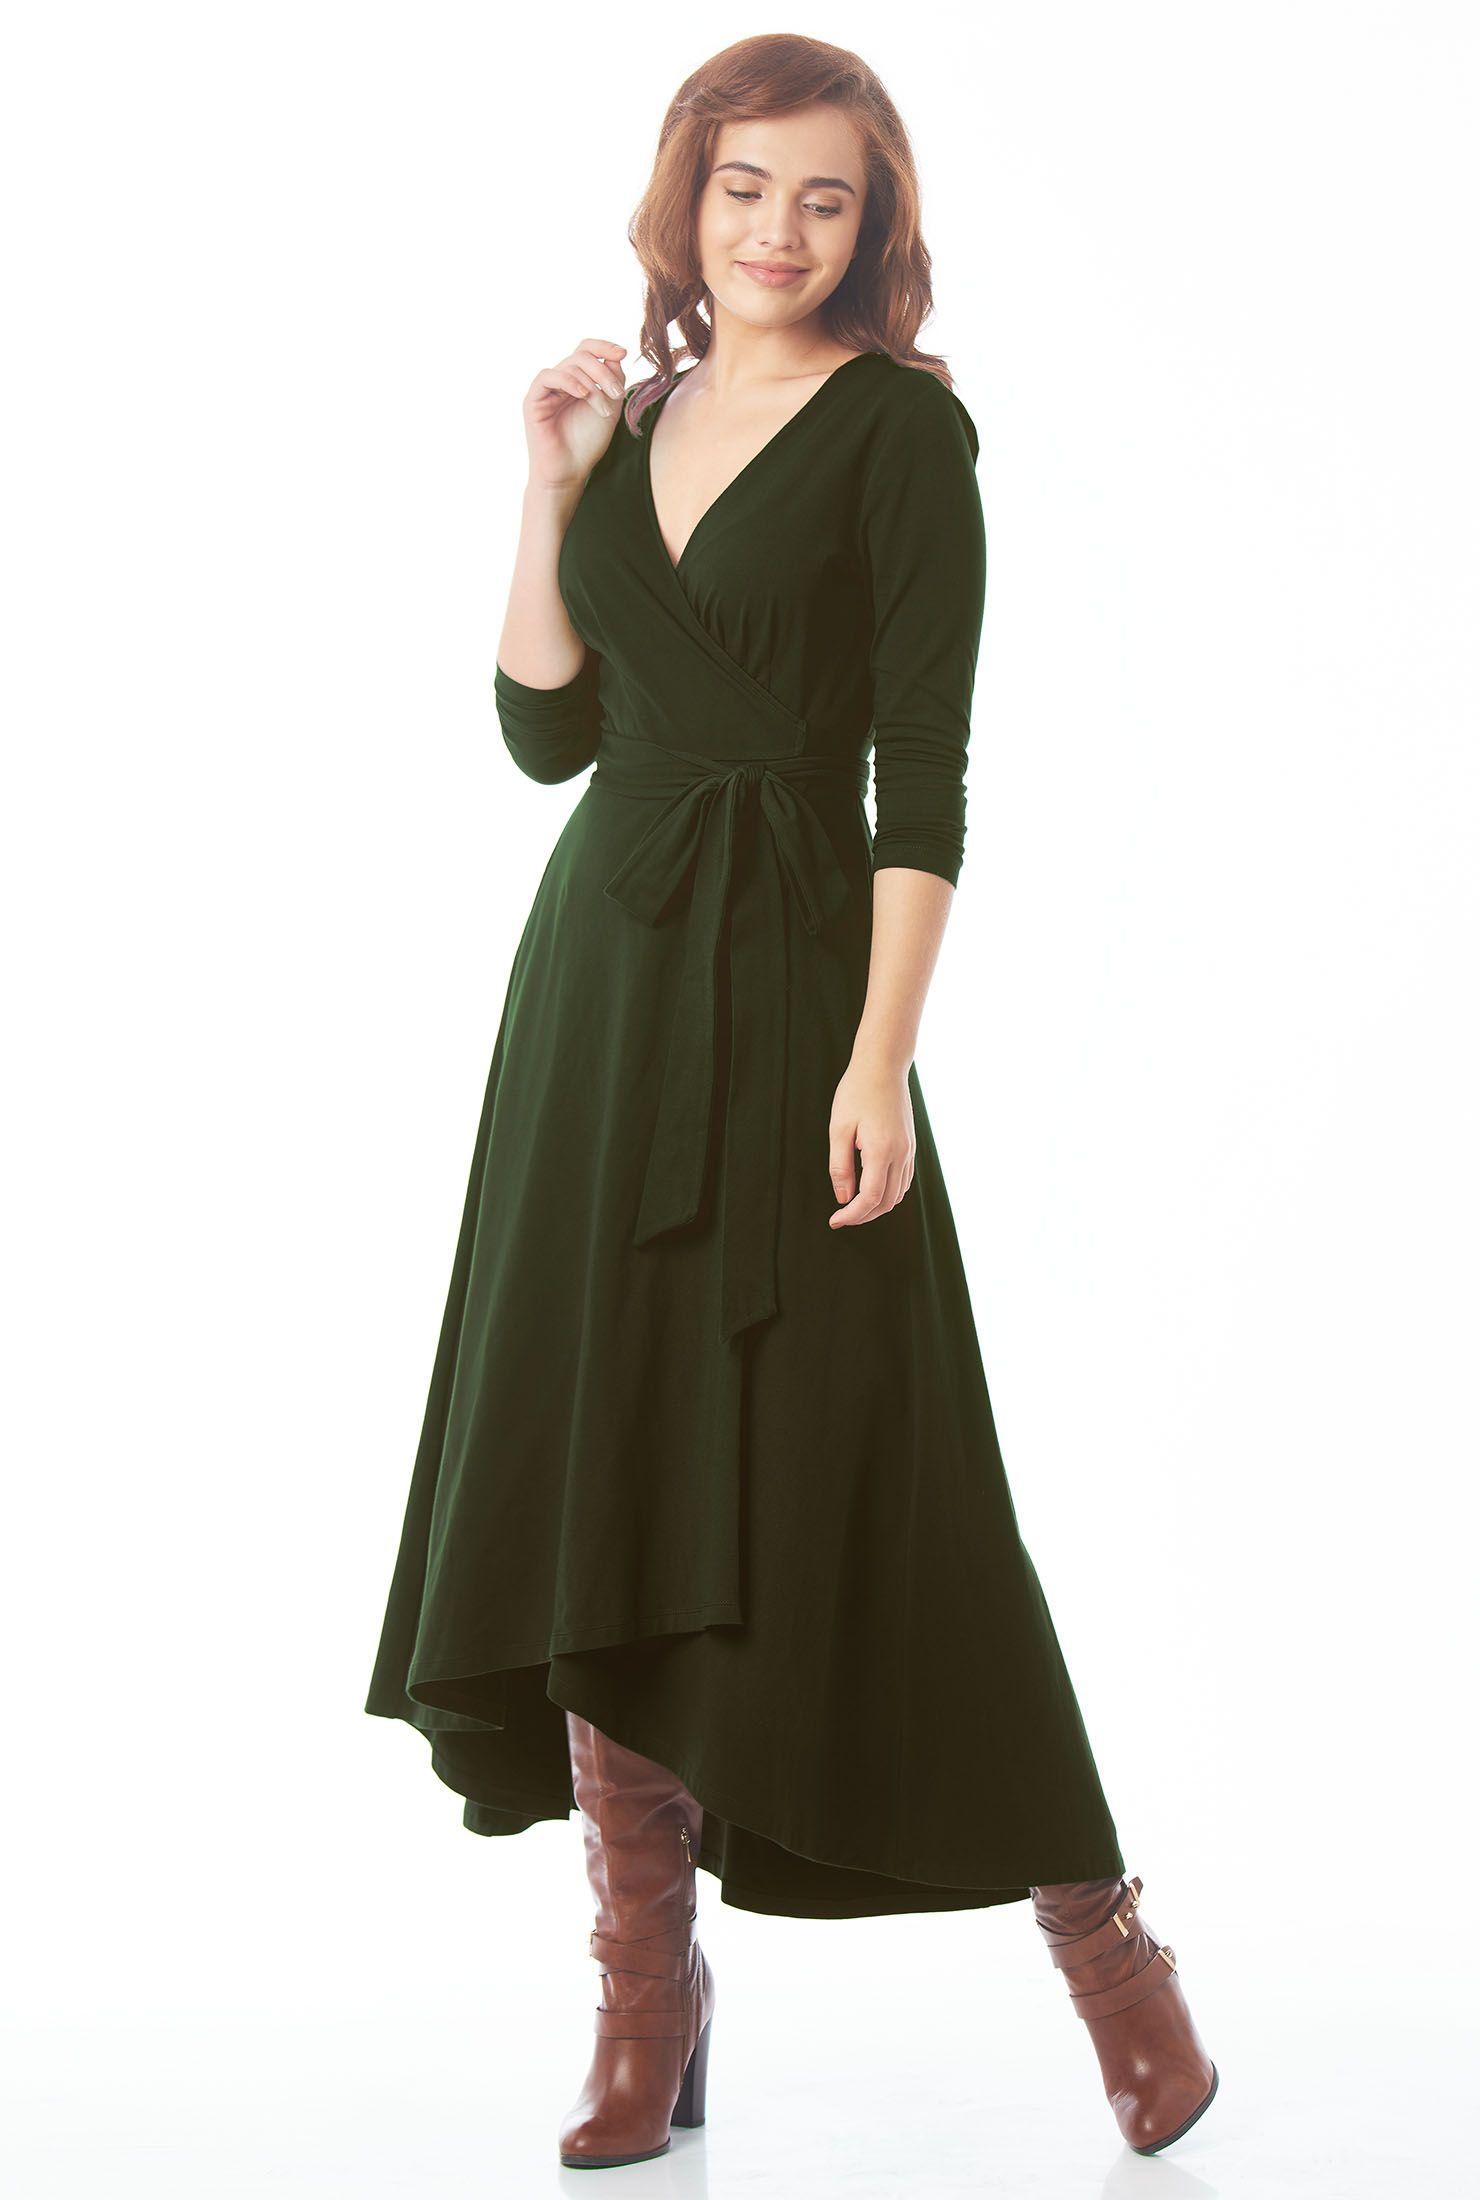 Eshakti Fashion Designer Dresses Designer Tops And Designer Skirts Womens Fashion Designers Fashion Clothes Women Fashion Fashion Outfits